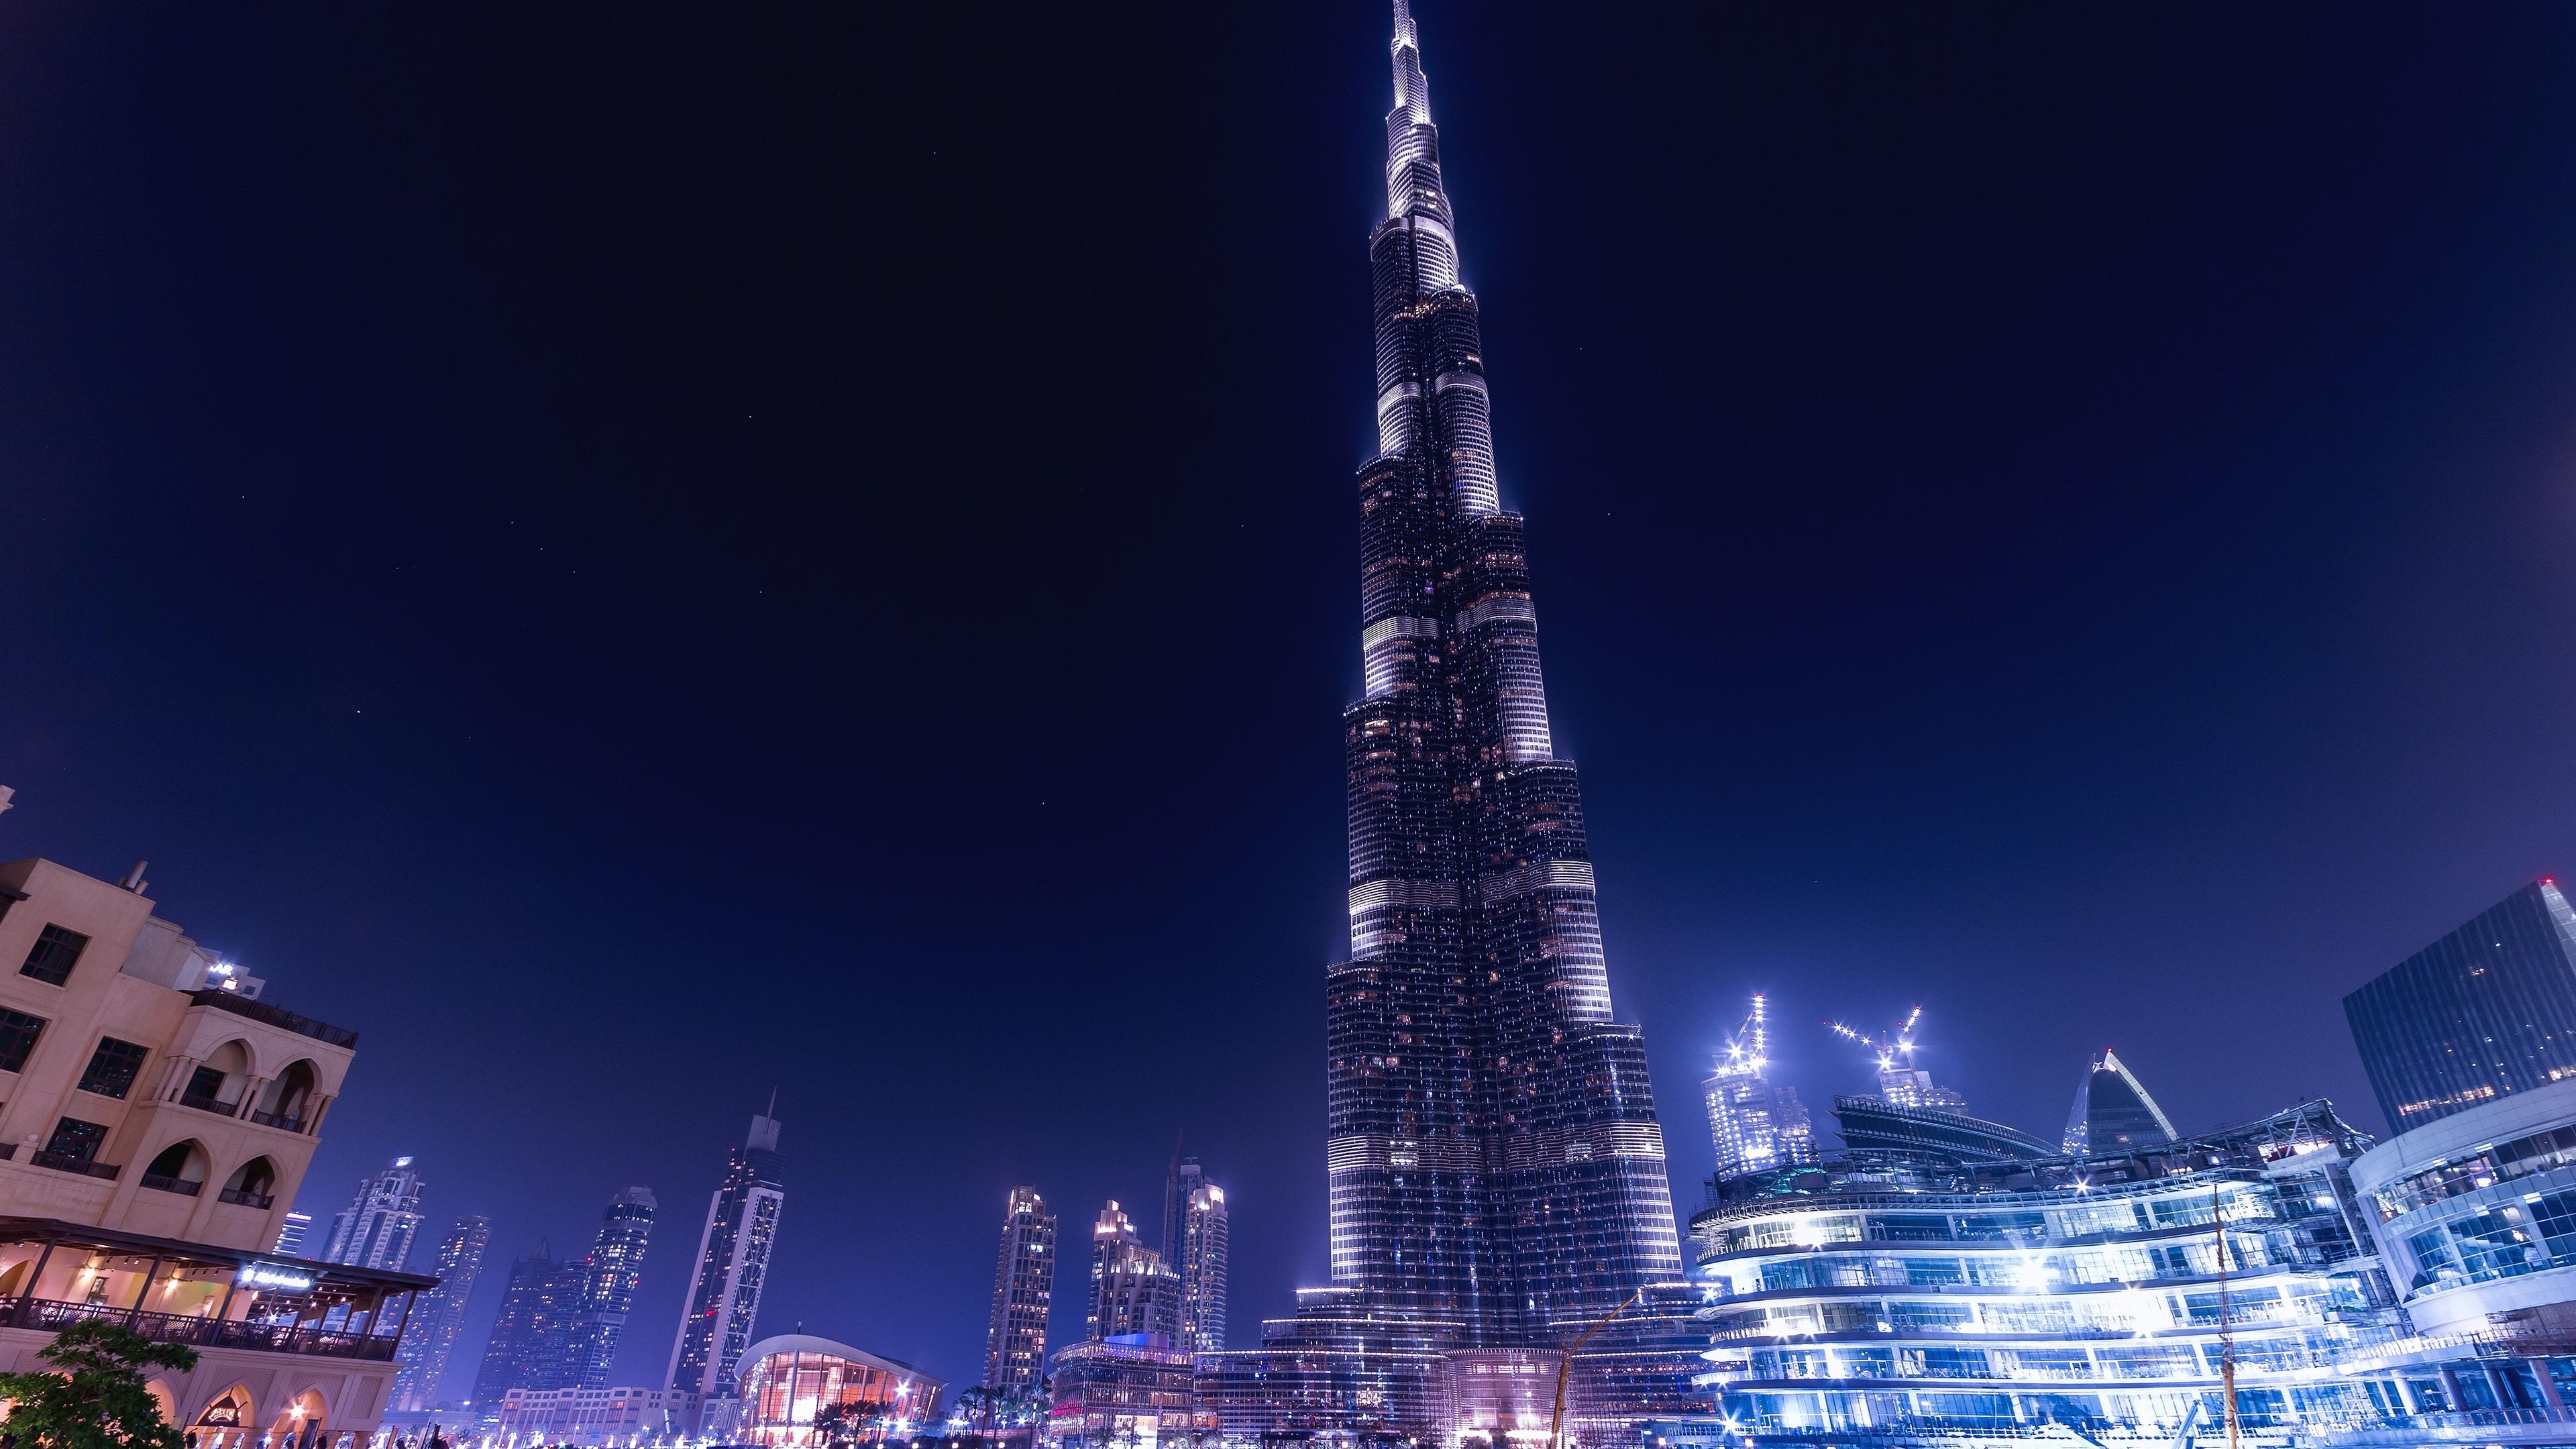 burj khalifa dubai night 1538069337 - Burj Khalifa Dubai Night - world wallpapers, night wallpapers, lights wallpapers, hd-wallpapers, dubai wallpapers, burj khalifa wallpapers, buildings wallpapers, 4k-wallpapers